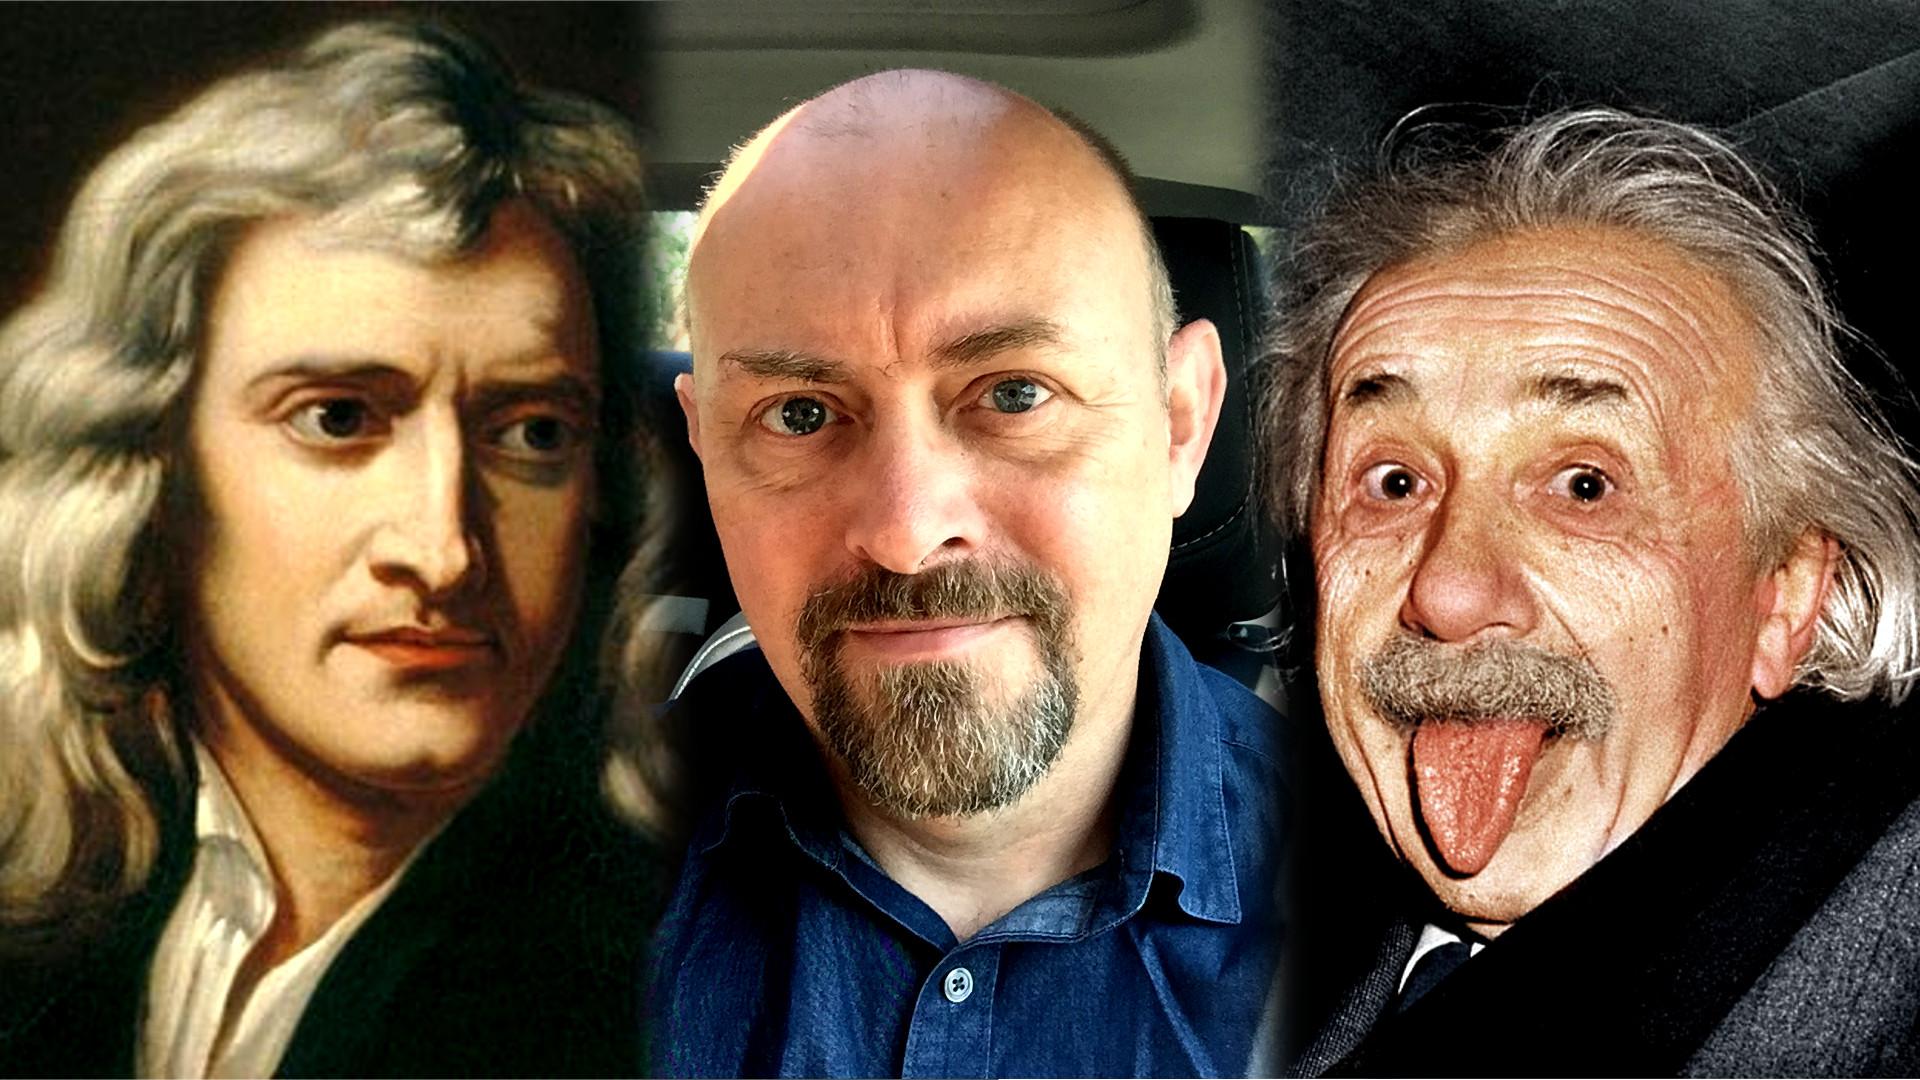 Sir Isaac newton, Matthew Lawrence and Albert Einstein